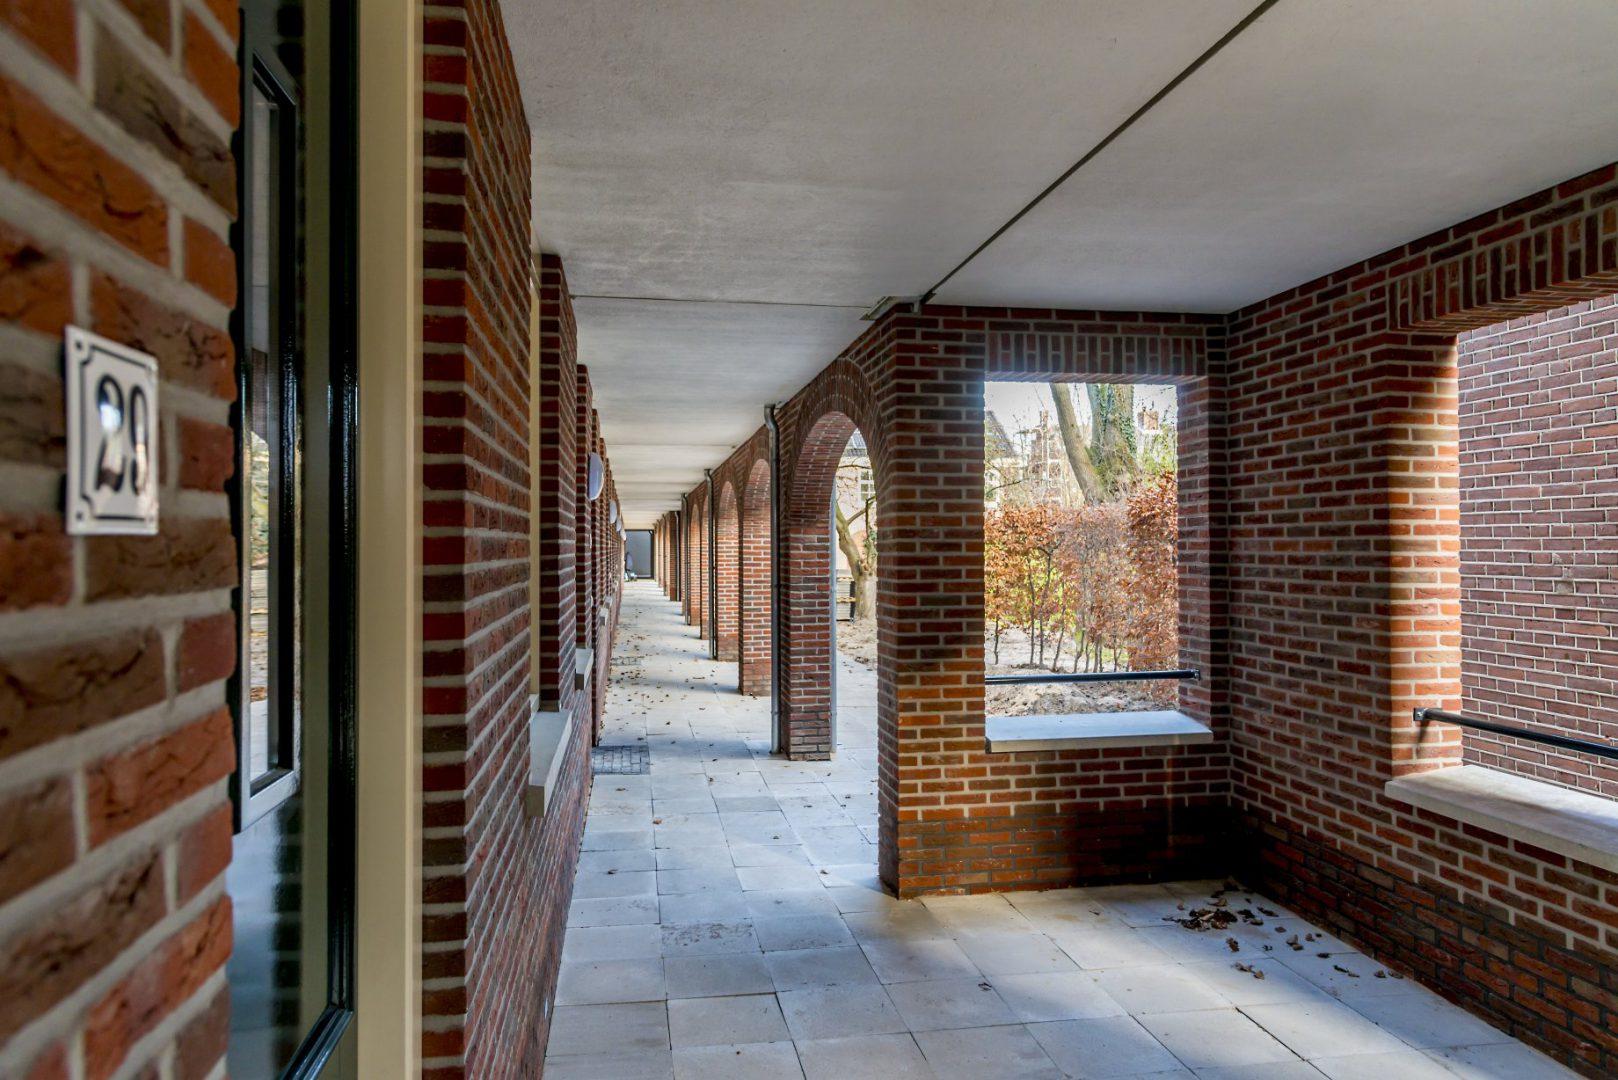 Ringershof-galerij-ZIJLSTRA-SCHIPPER-architecten-architectenbureau-noord-holland-architect-010